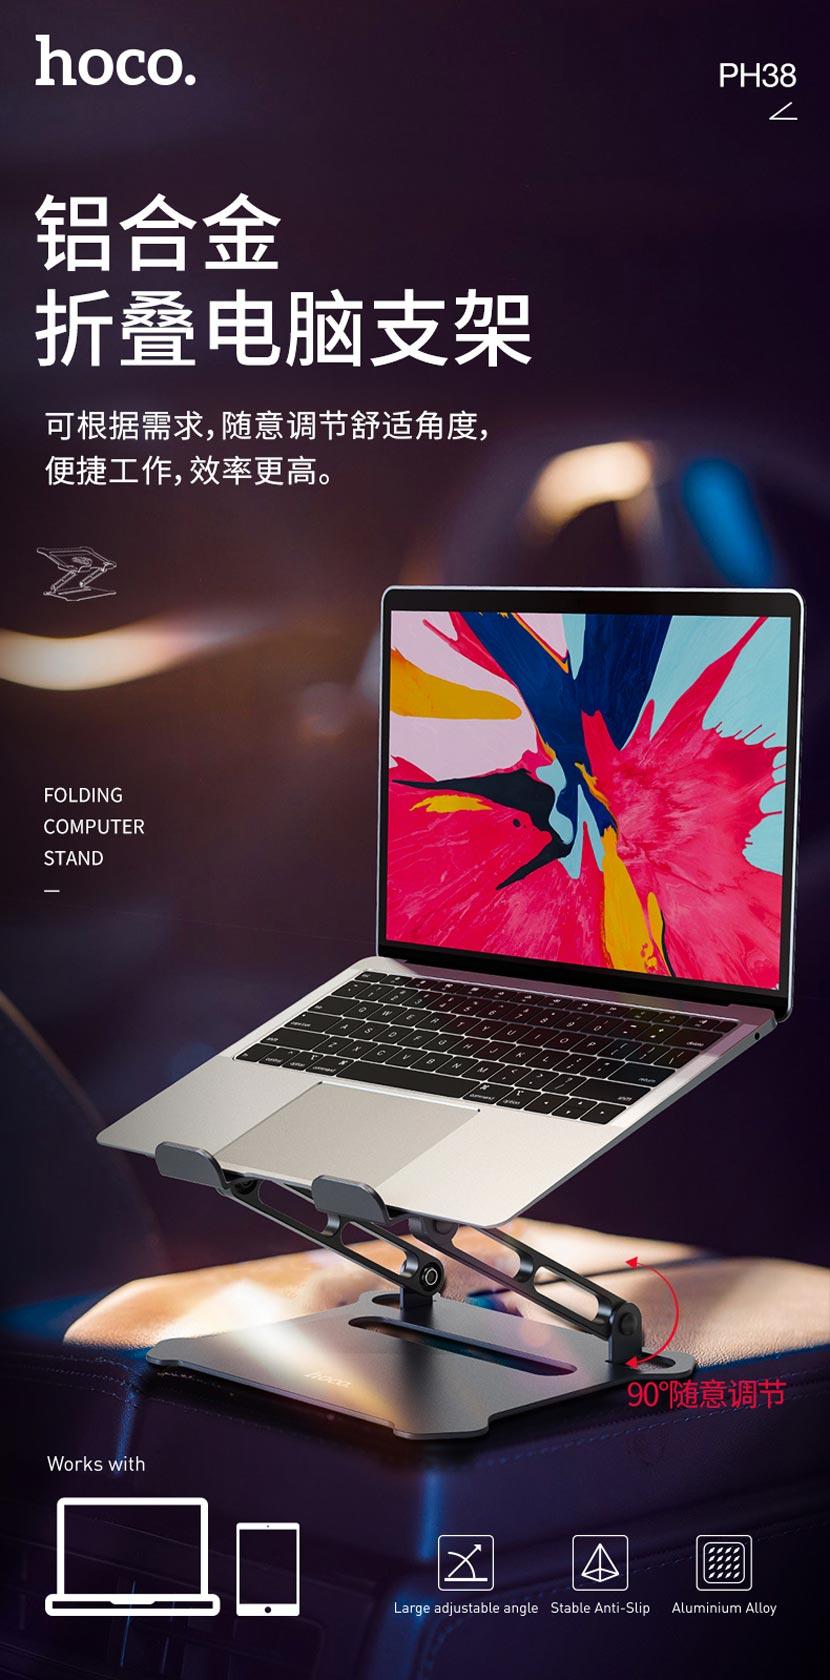 hoco ph38 diamond aluminum alloy folding laptop stand cn